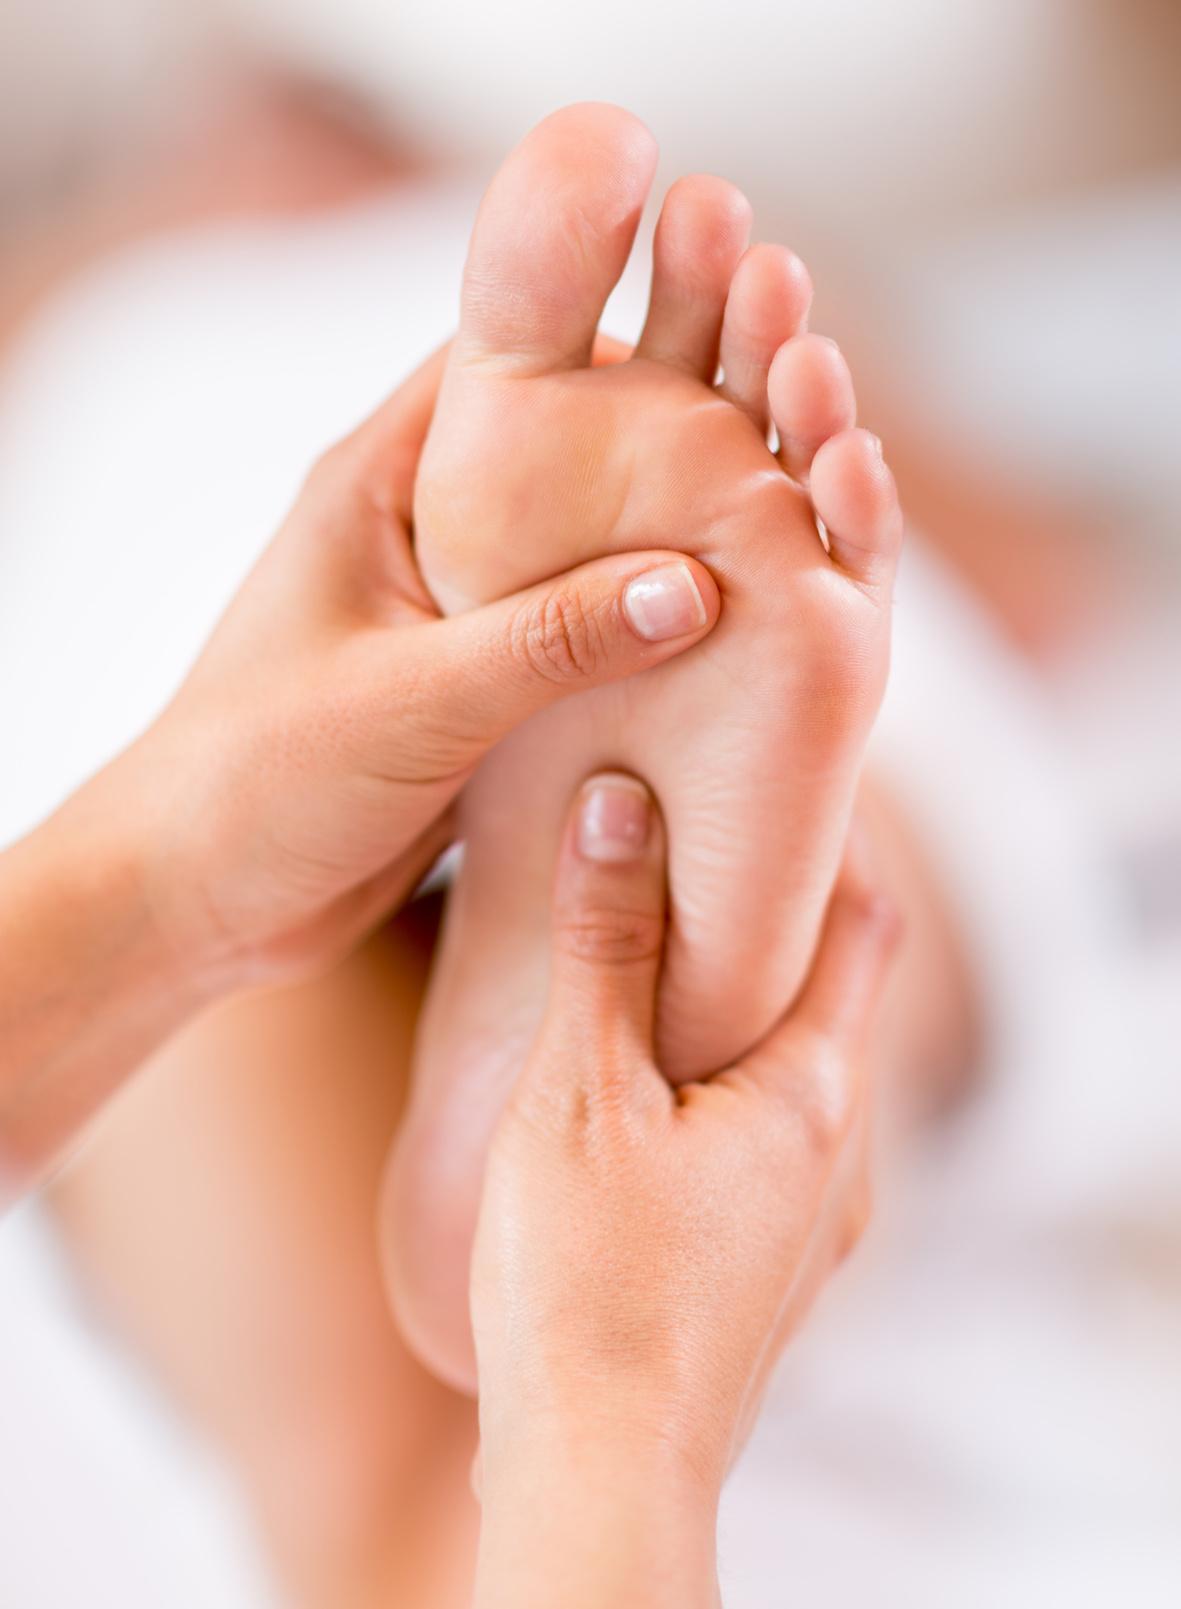 Natural Balance Reflexology - Regain your balance, regain your health